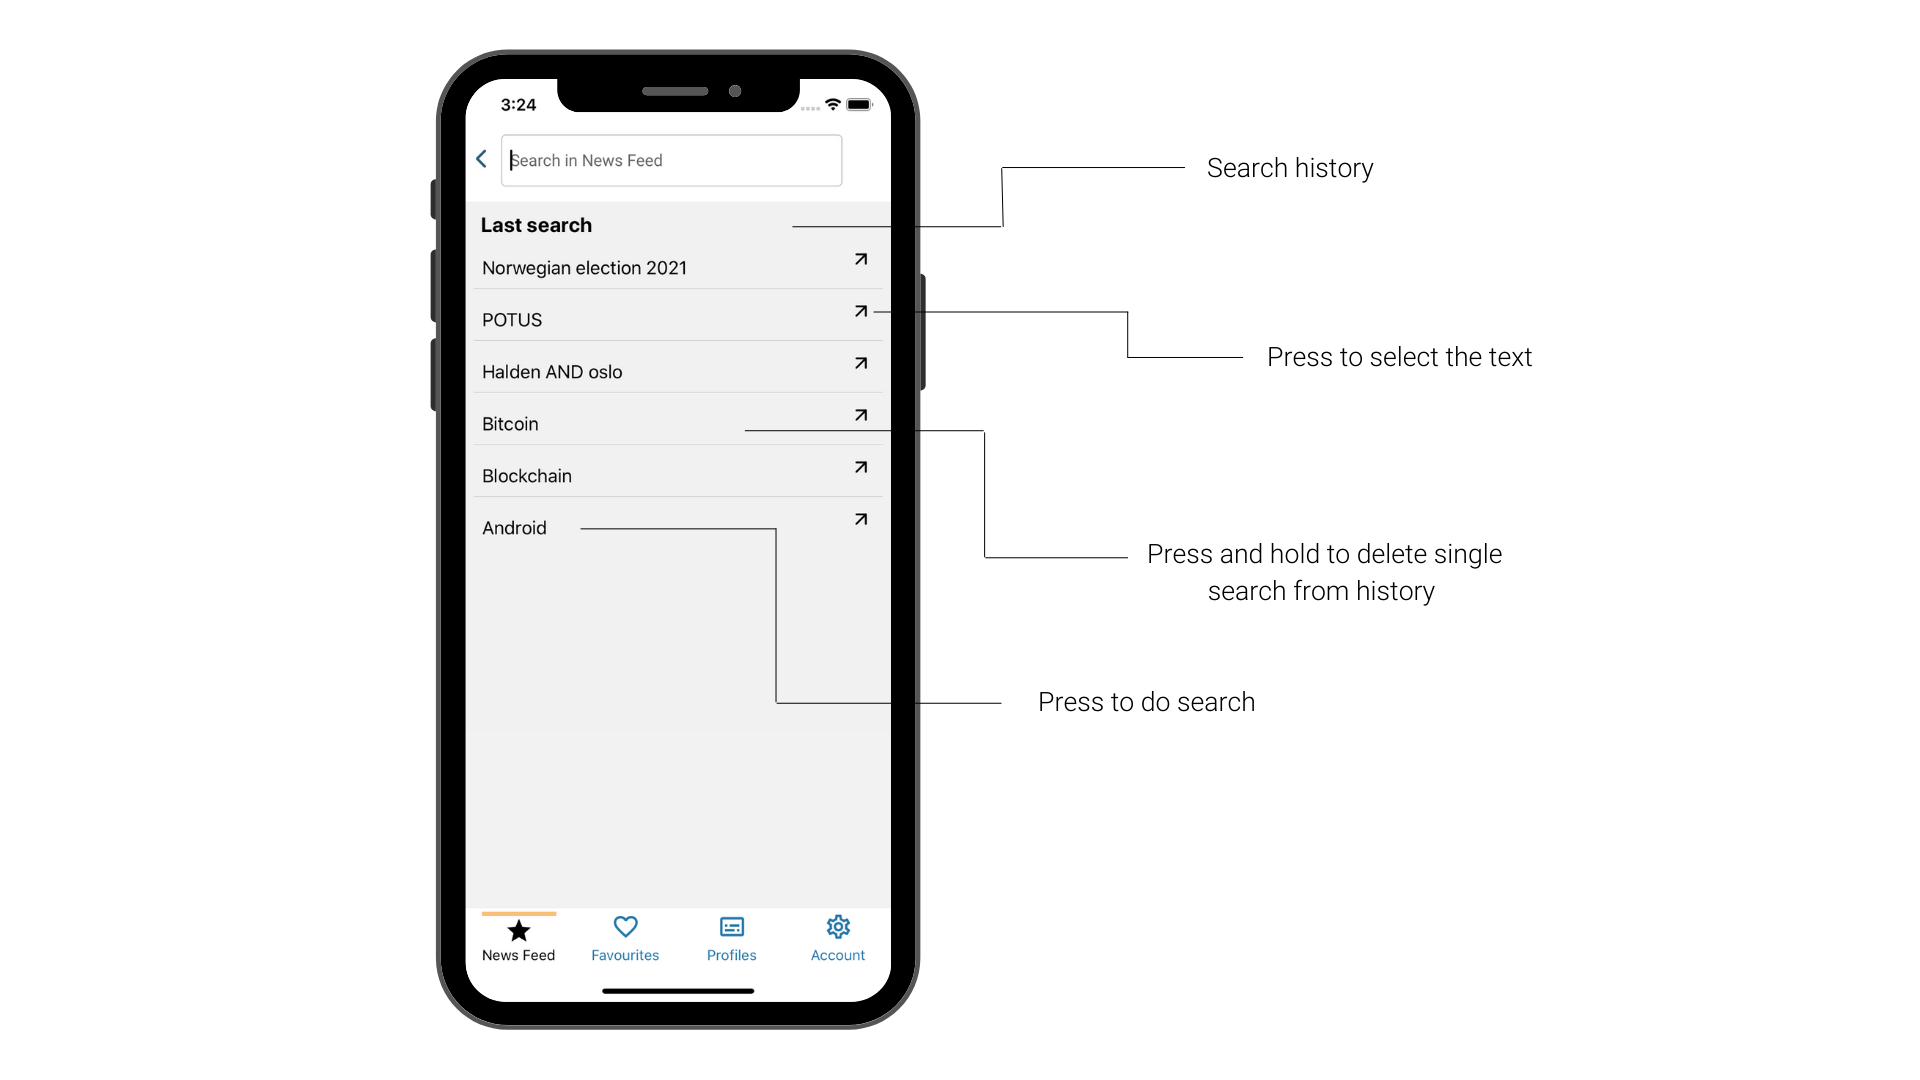 slider-retriever-app-image-3-search-v1